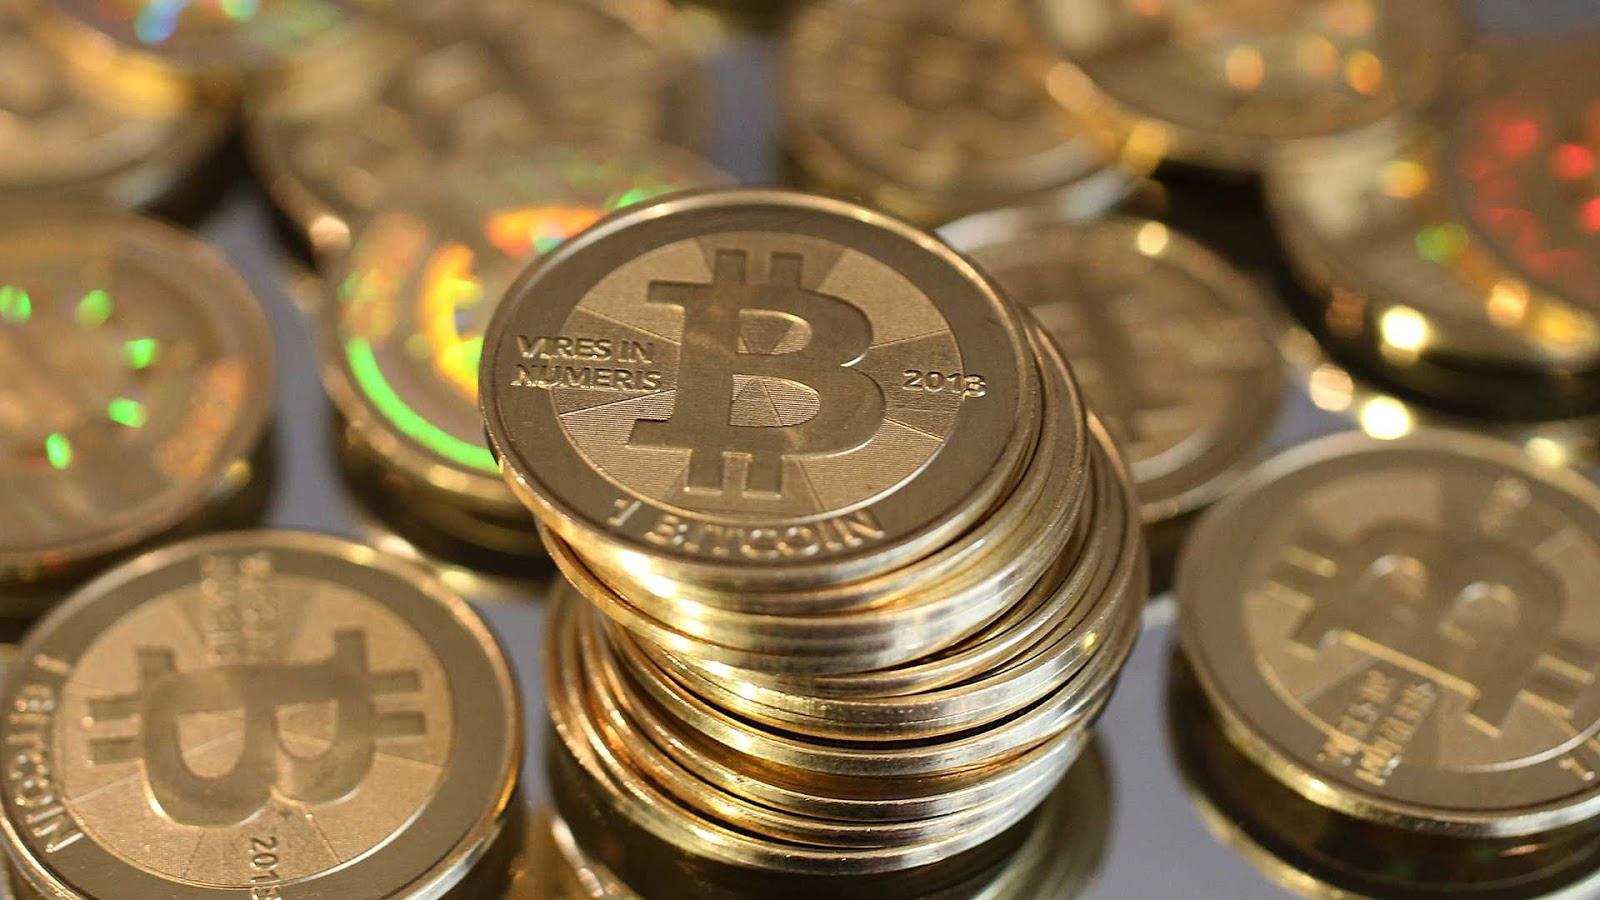 goldfish bitcoin ماهي عمله البيتكوين bitcoin